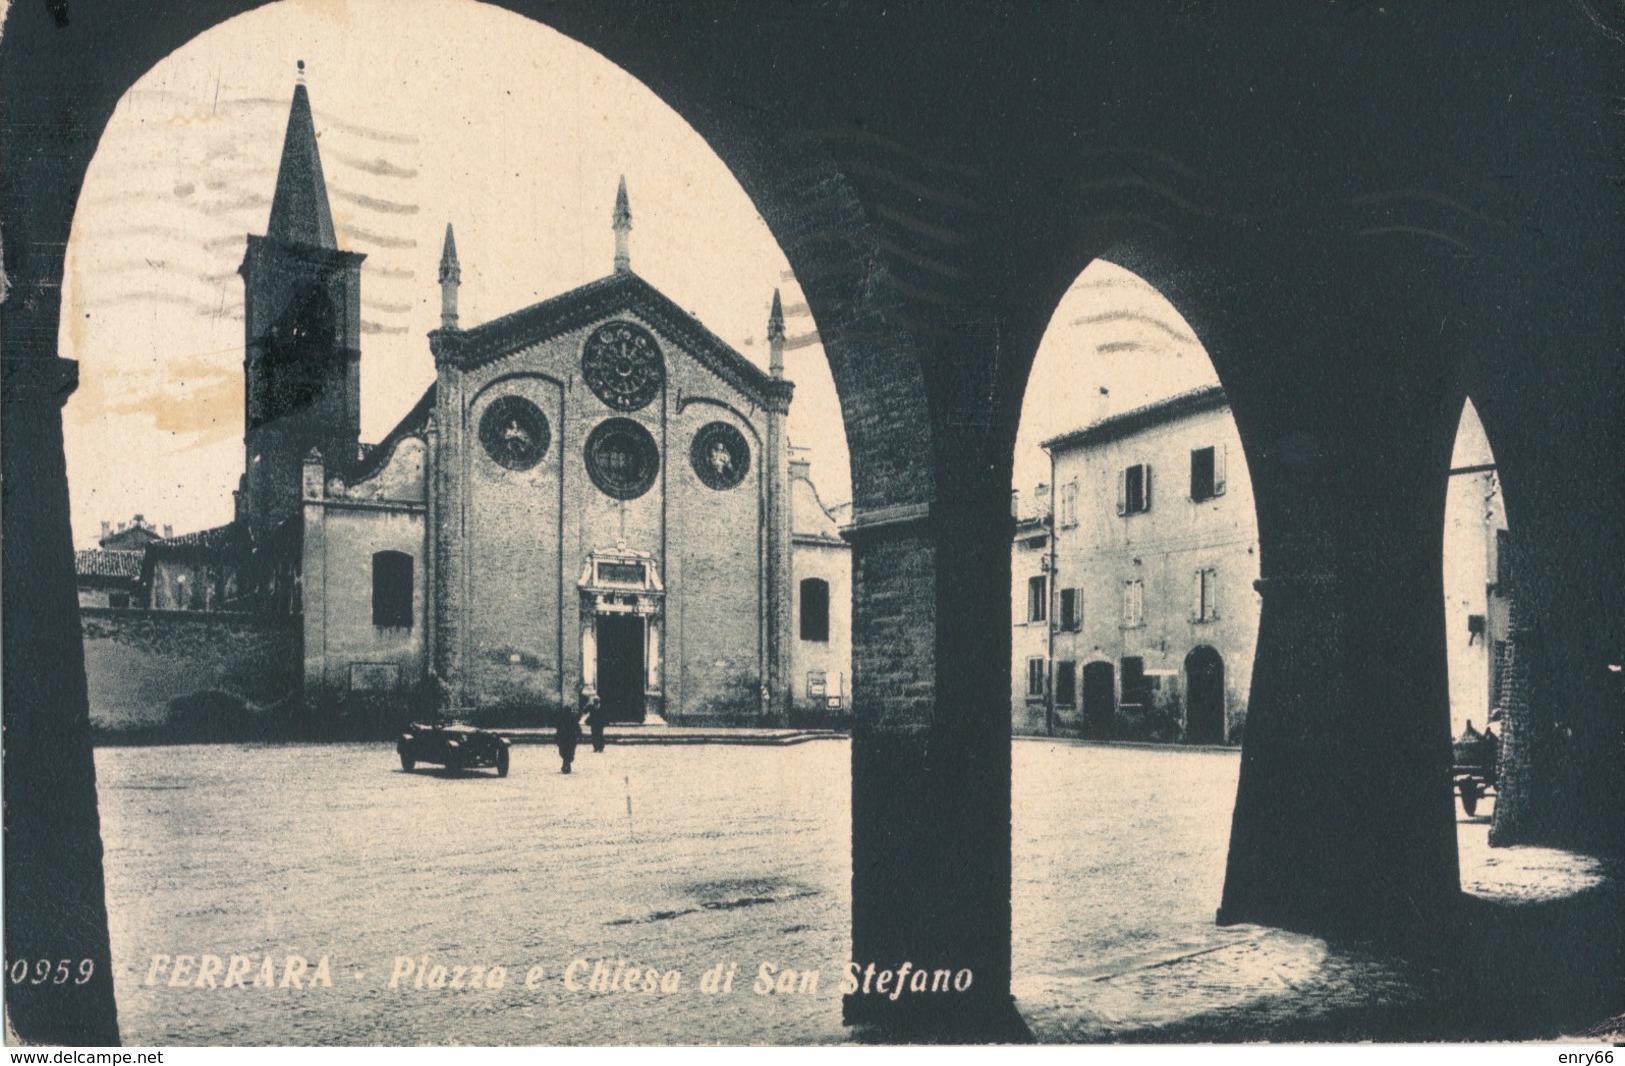 FERRARA-PIAZZA E CHIESA DI SANTO STEFANO - Ferrara